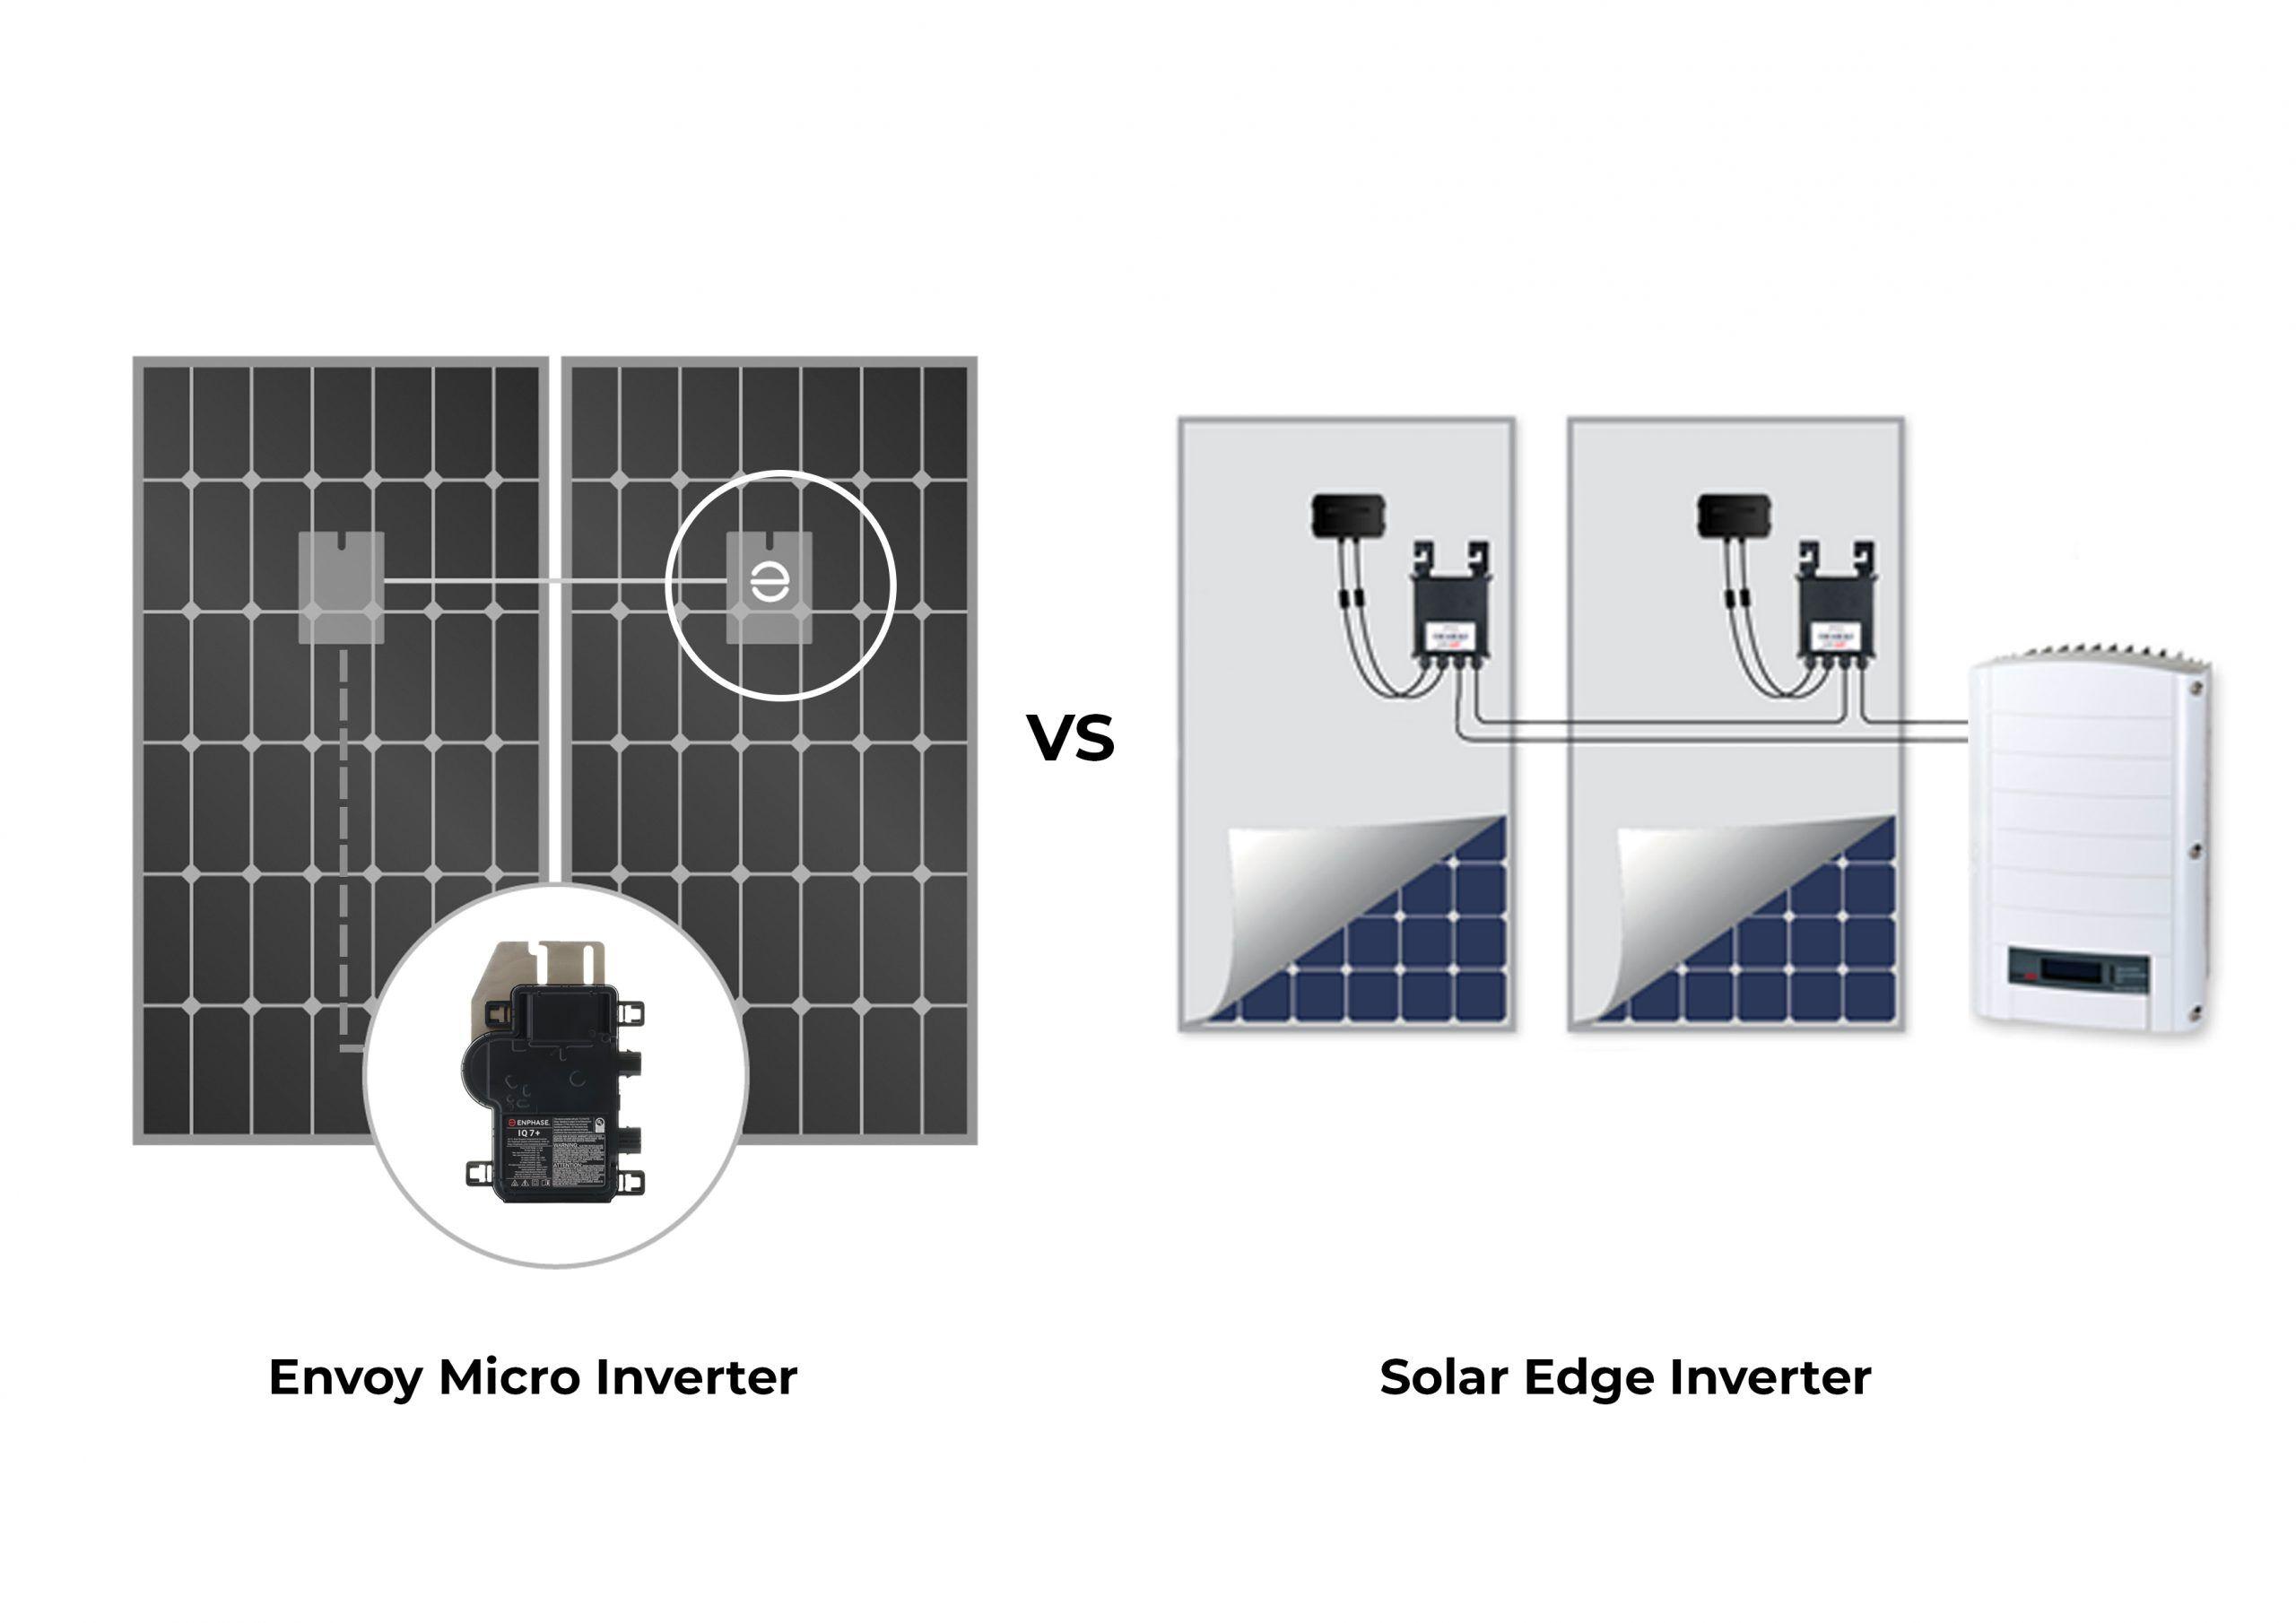 Envoy and Solar Edge Inverter